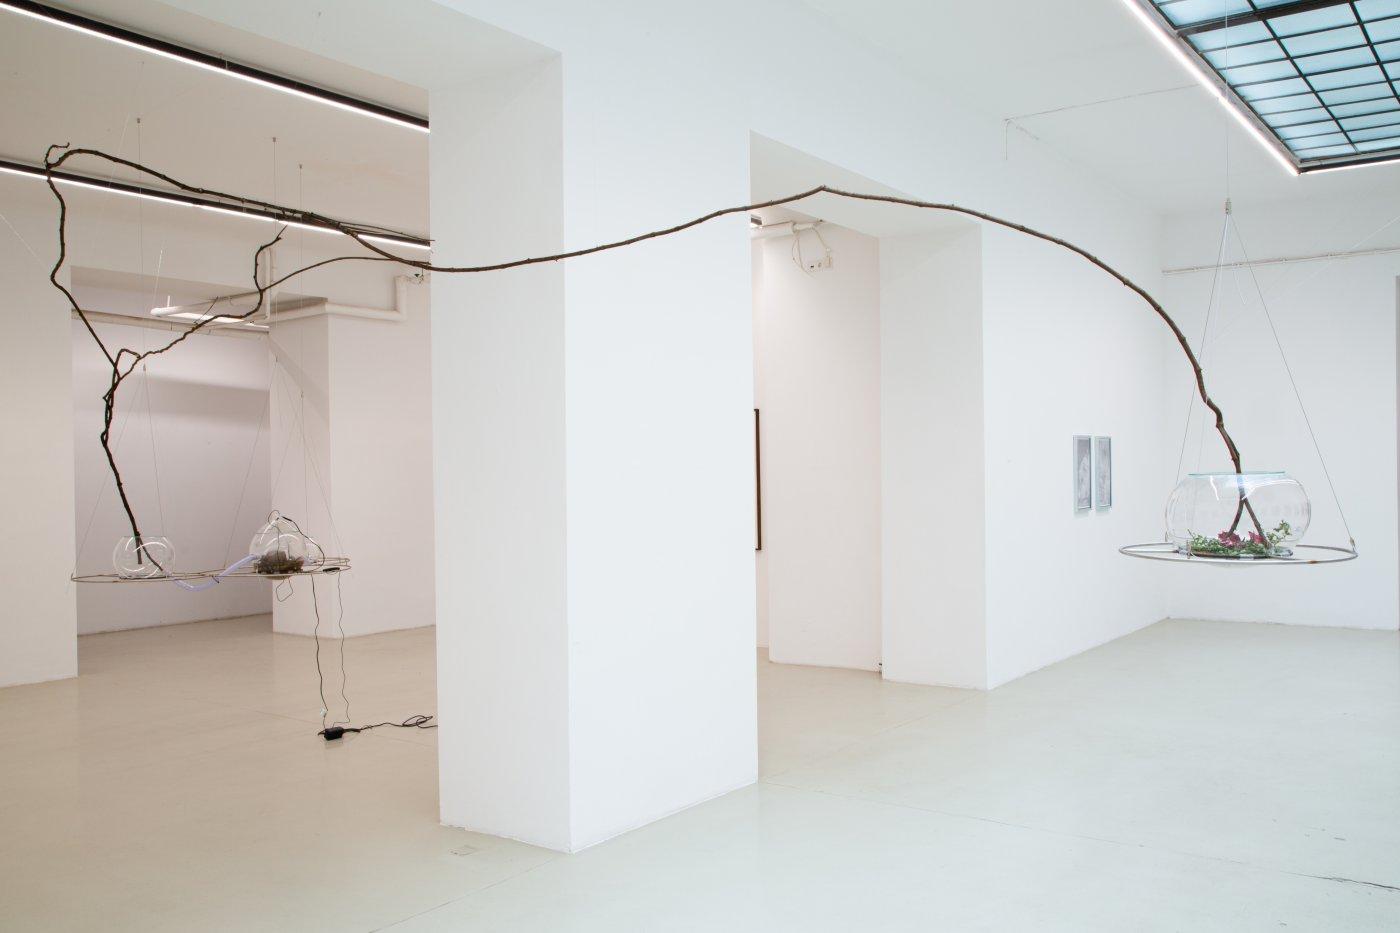 Galerie Kandlhofer Maximilian Prufer 3